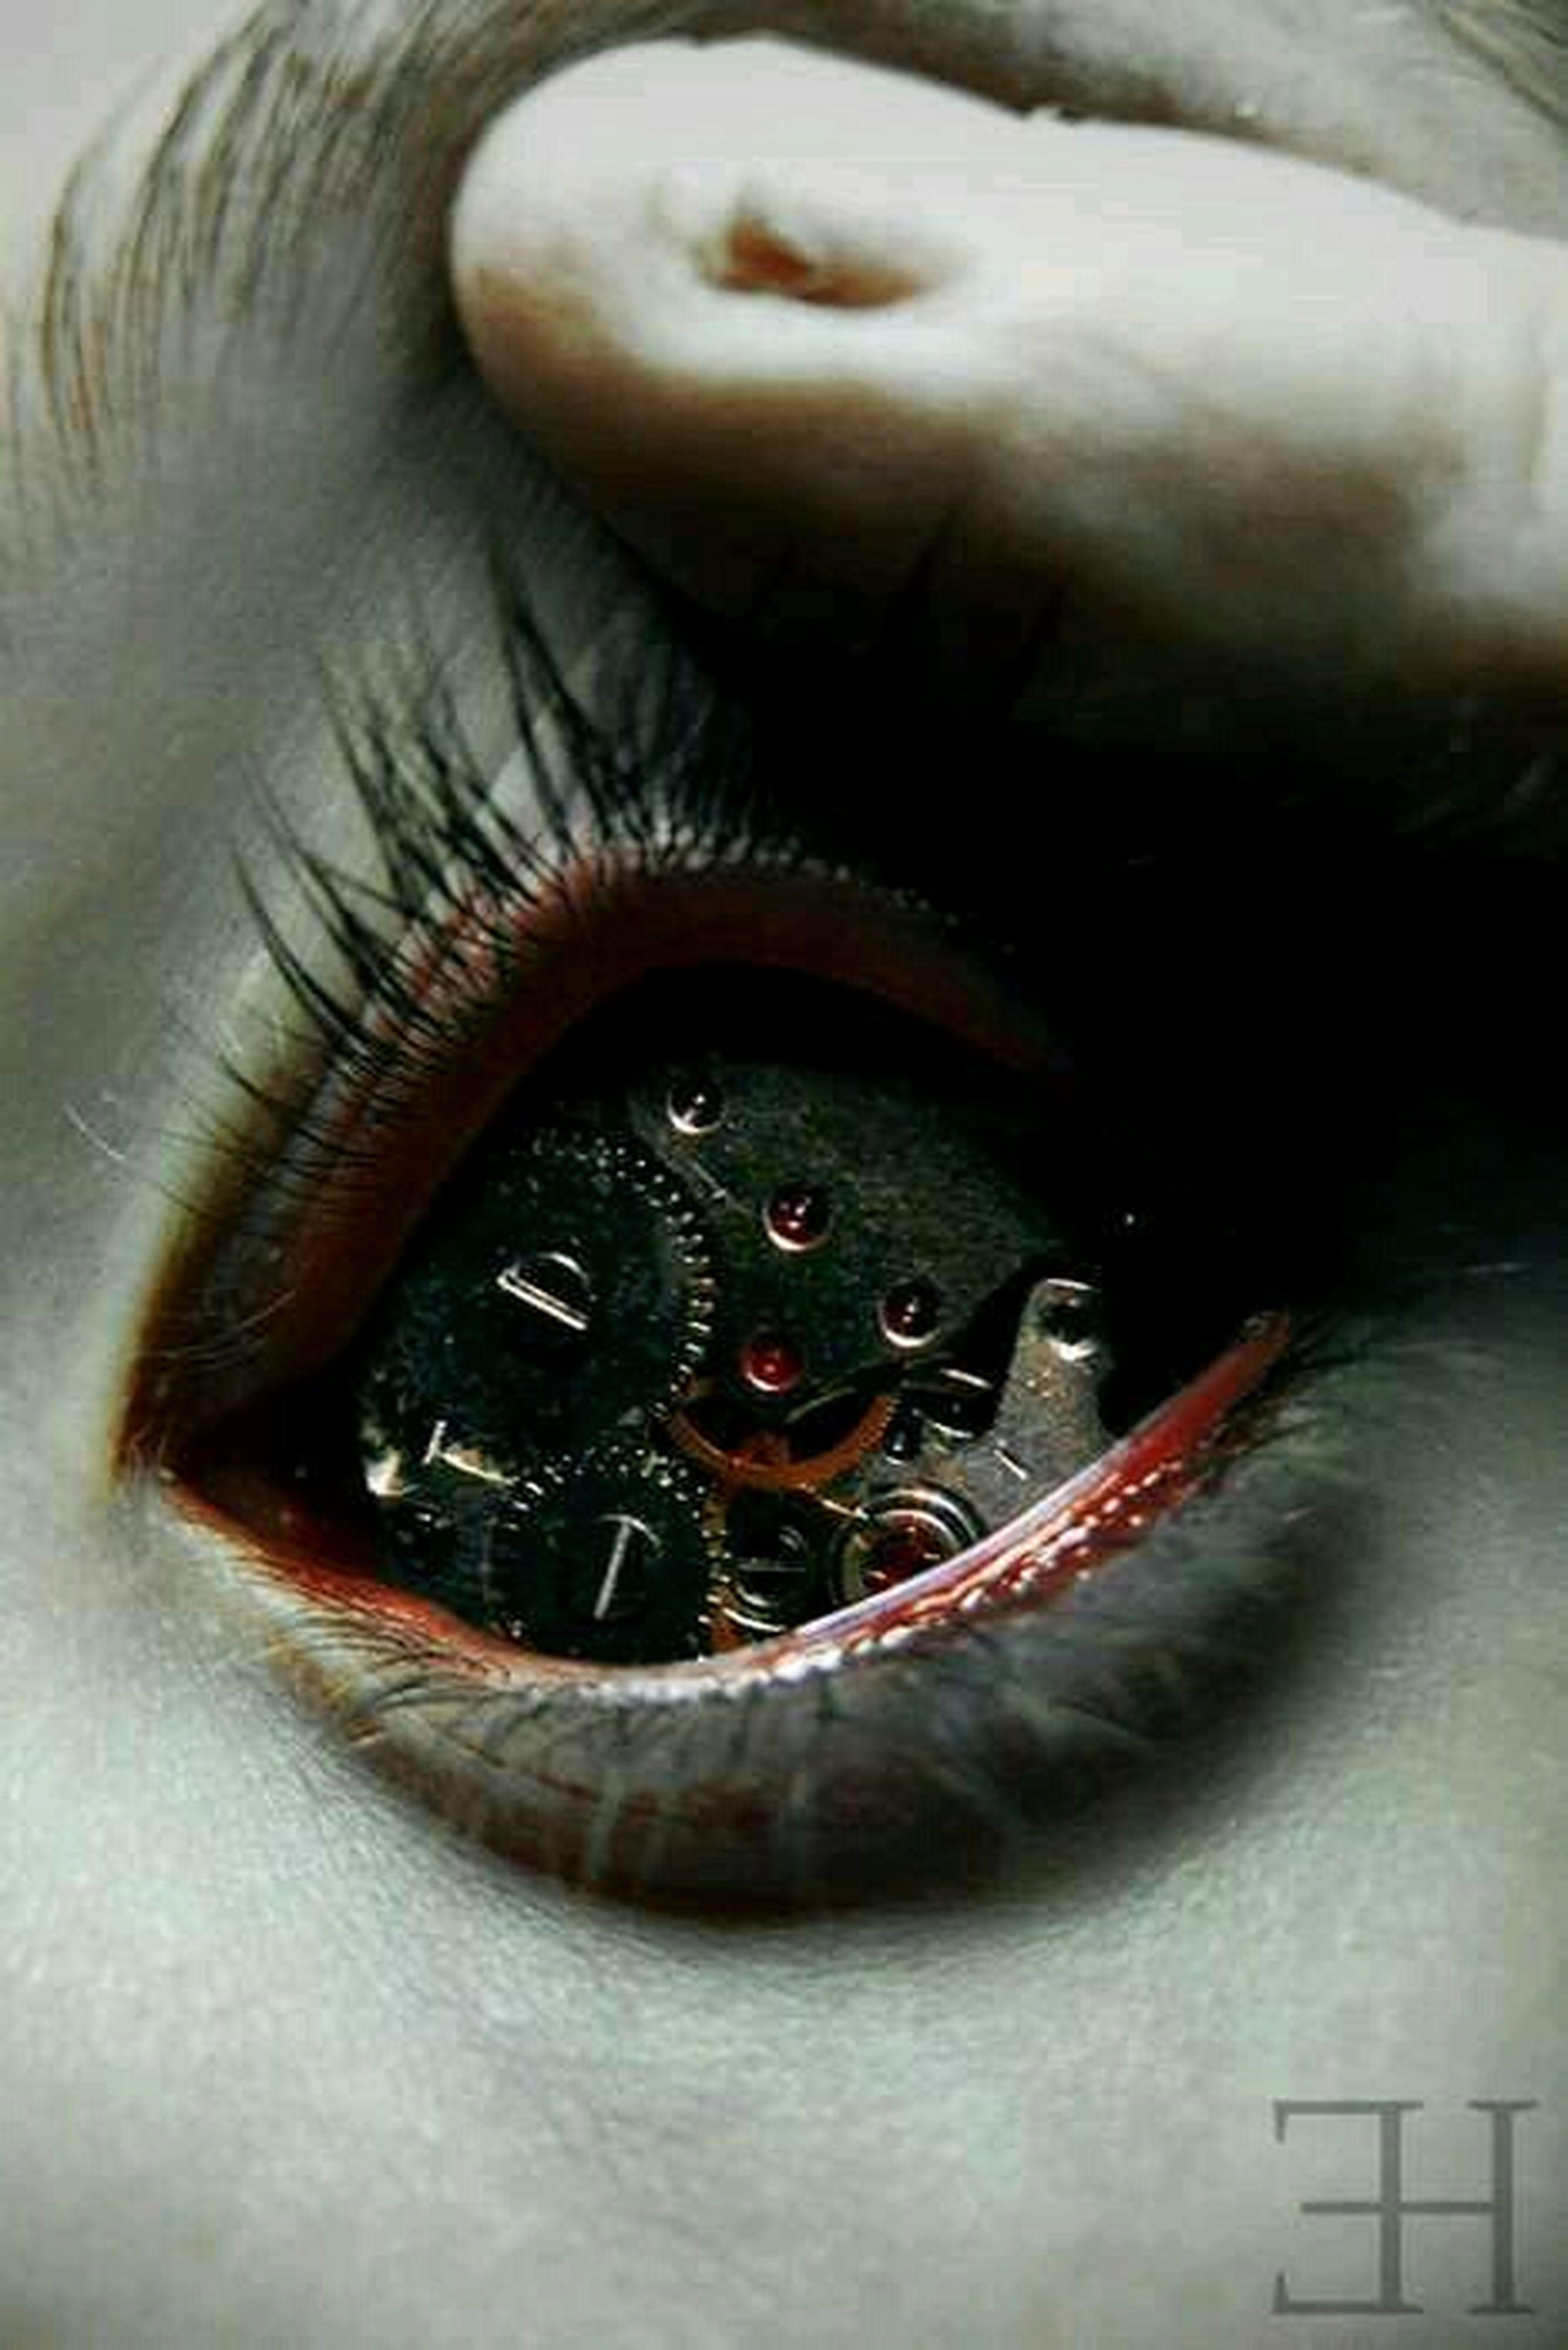 close-up, human eye, part of, eyesight, eyelash, extreme close-up, indoors, sensory perception, portrait, extreme close up, looking at camera, unrecognizable person, human face, eyeball, vision, detail, human skin